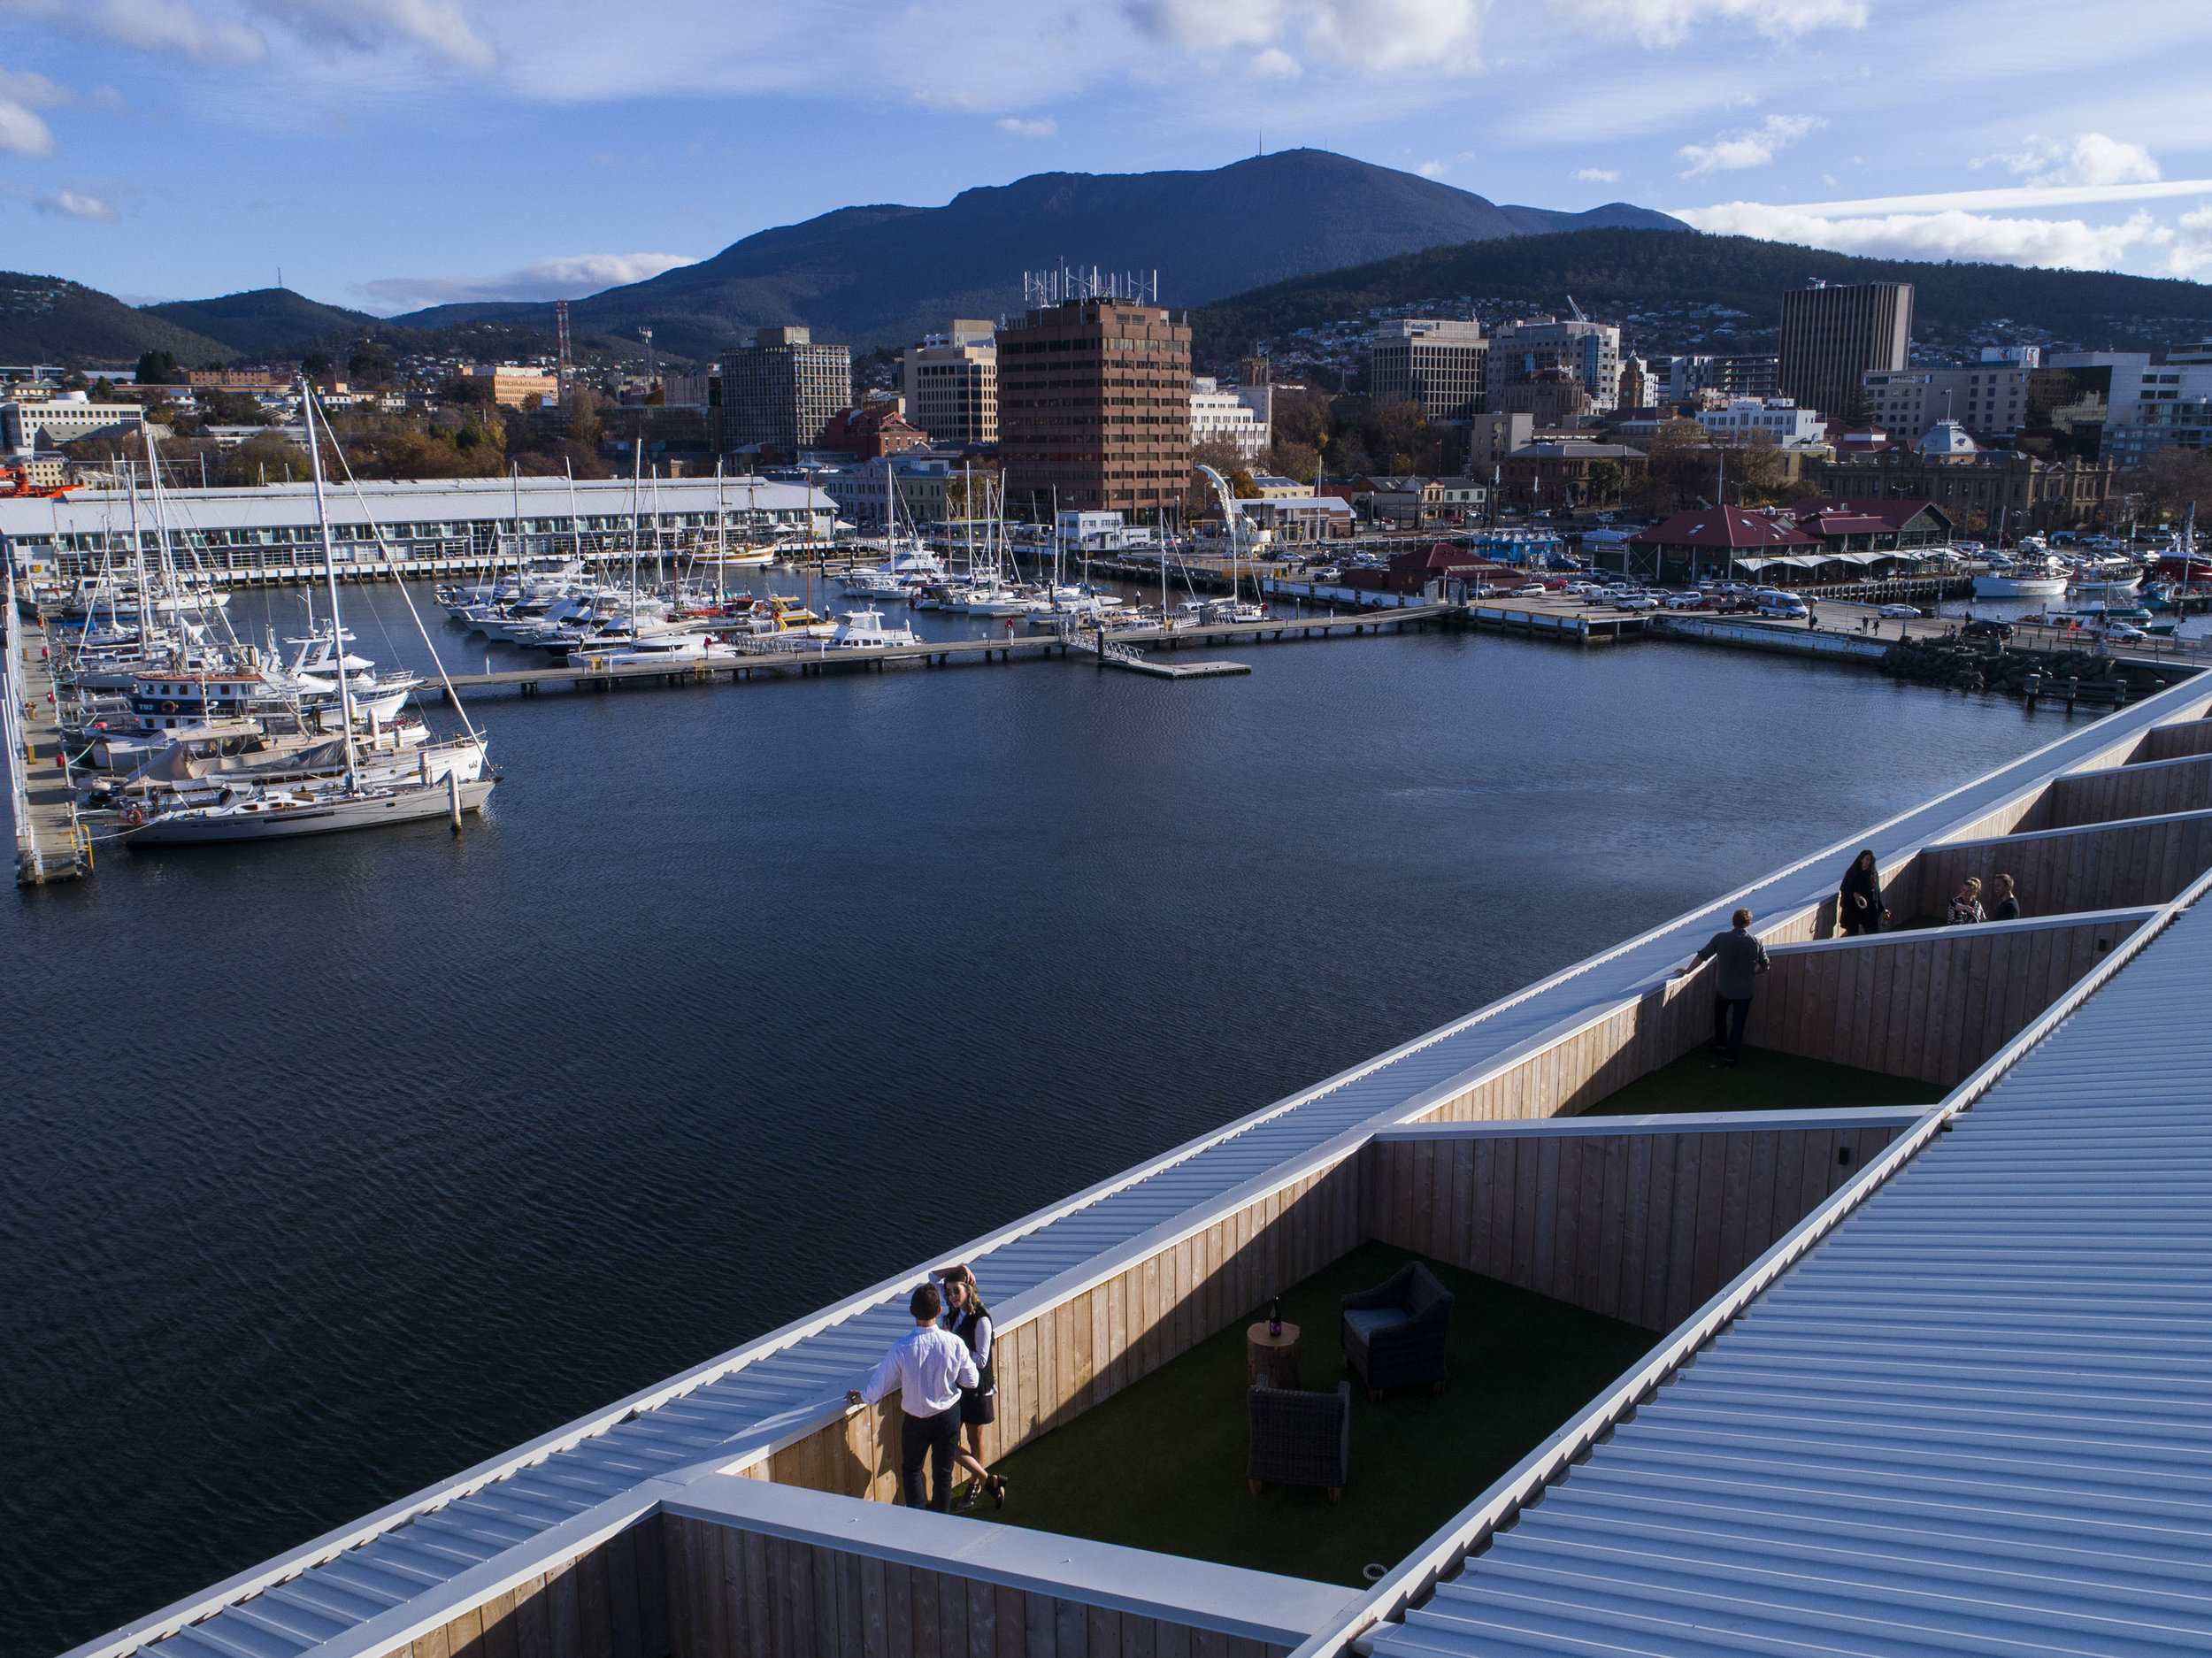 Complimentary Hobart Hotel Pickup & Drop off - Door to Door Service - Check full listing